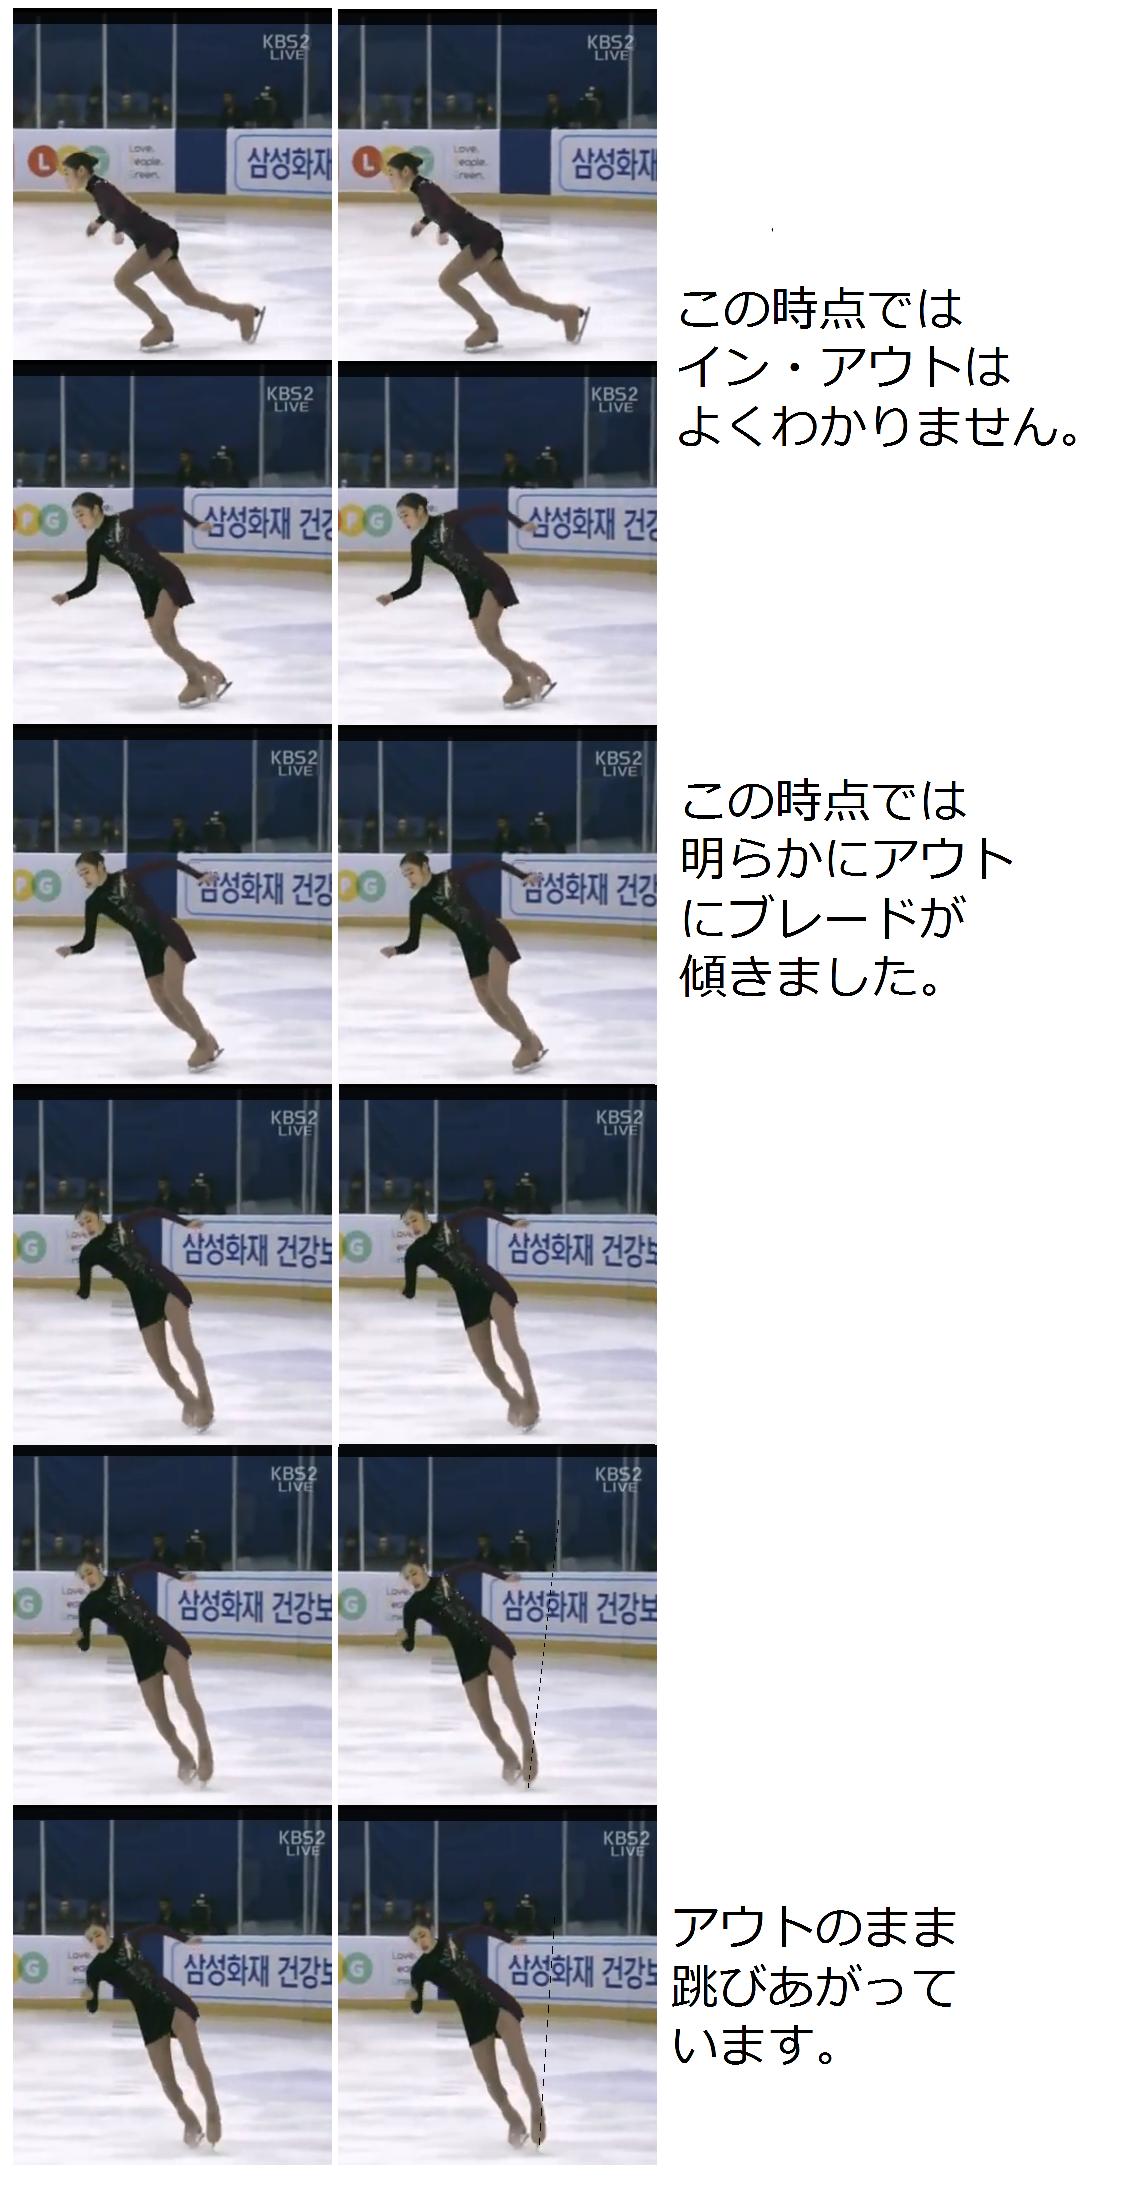 Yuna Kim Sochi Olympics unfair score 8